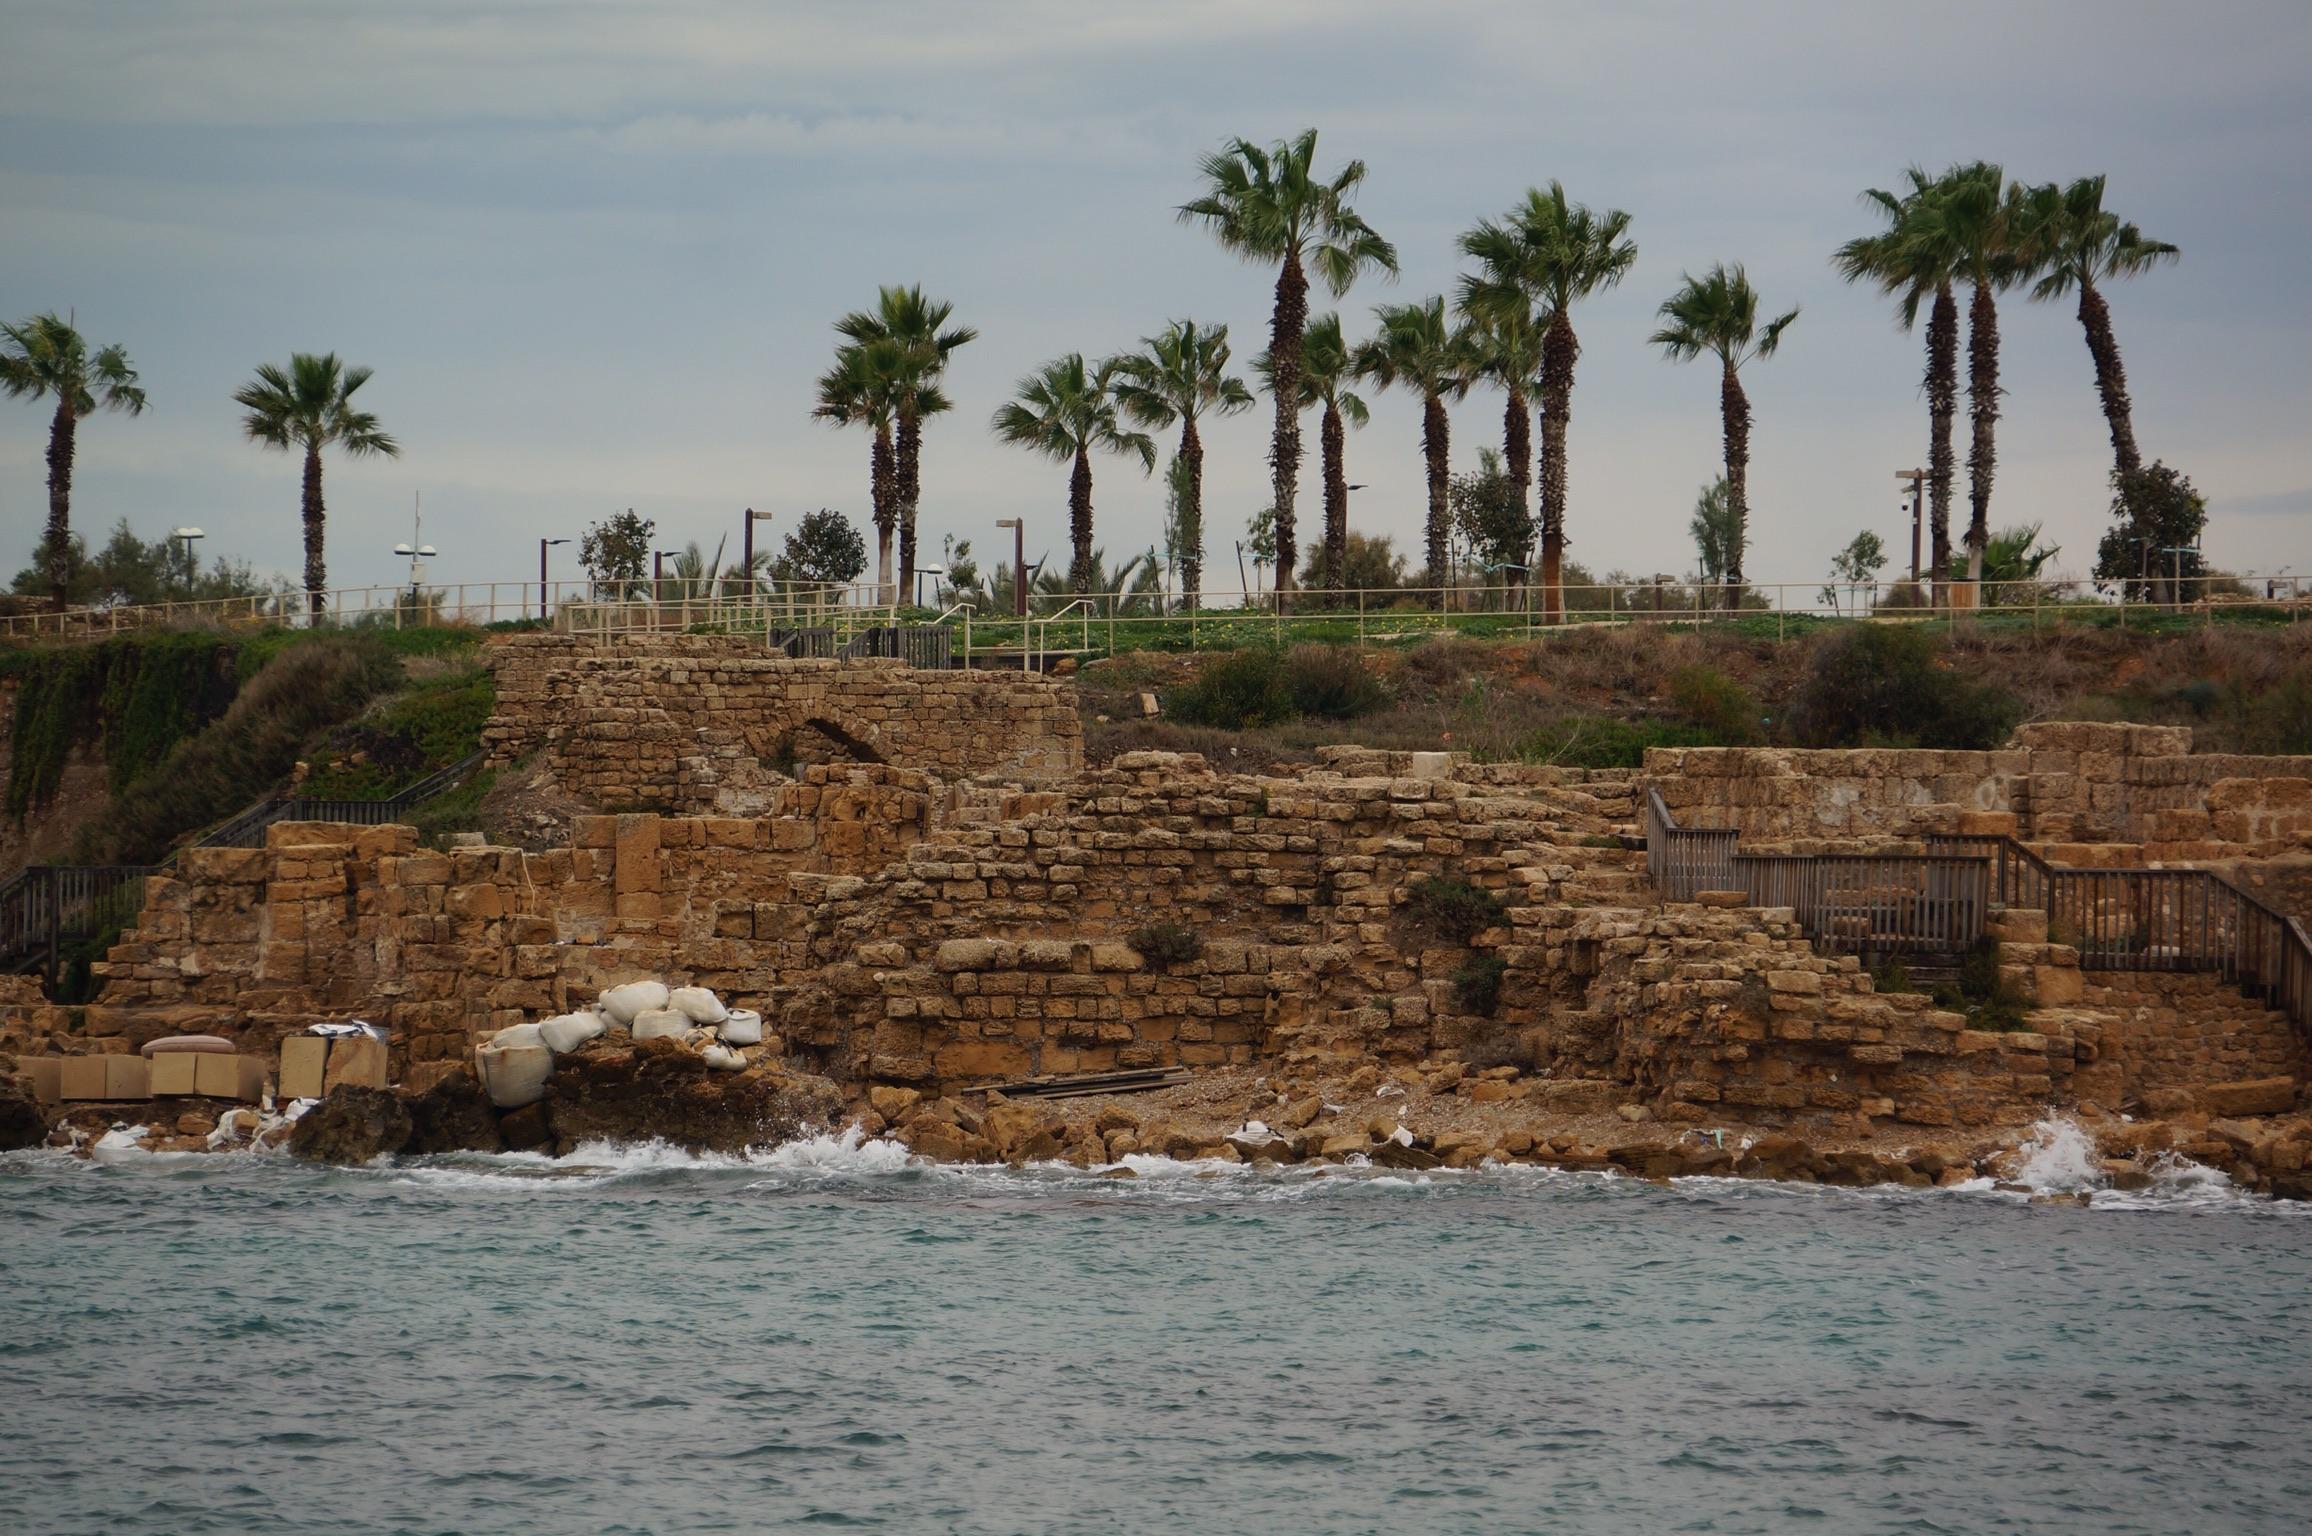 King Herod, Cesarea, and the Sea of Galilee